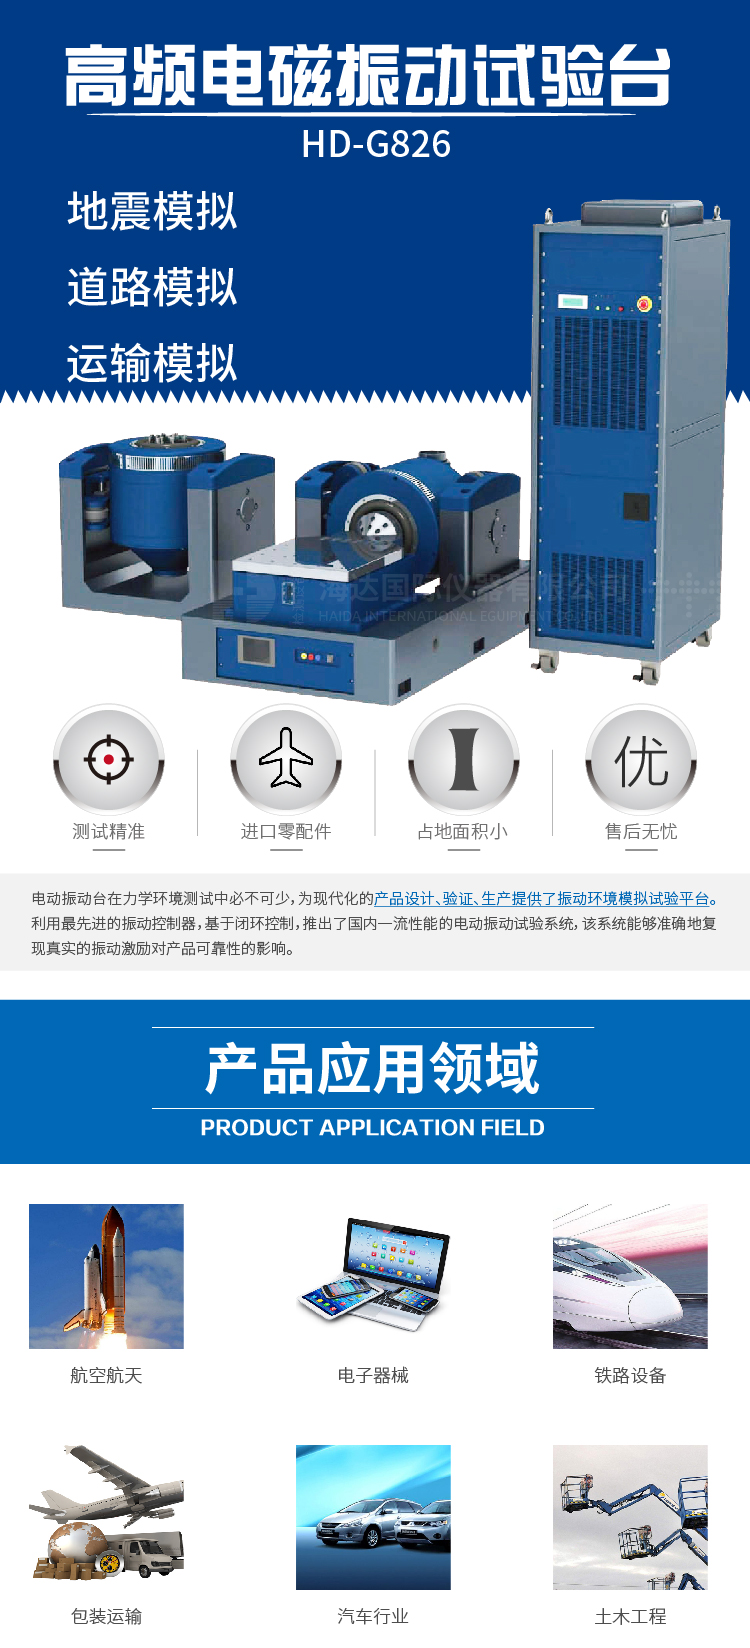 HD-G826電動振動系統-01.jpg